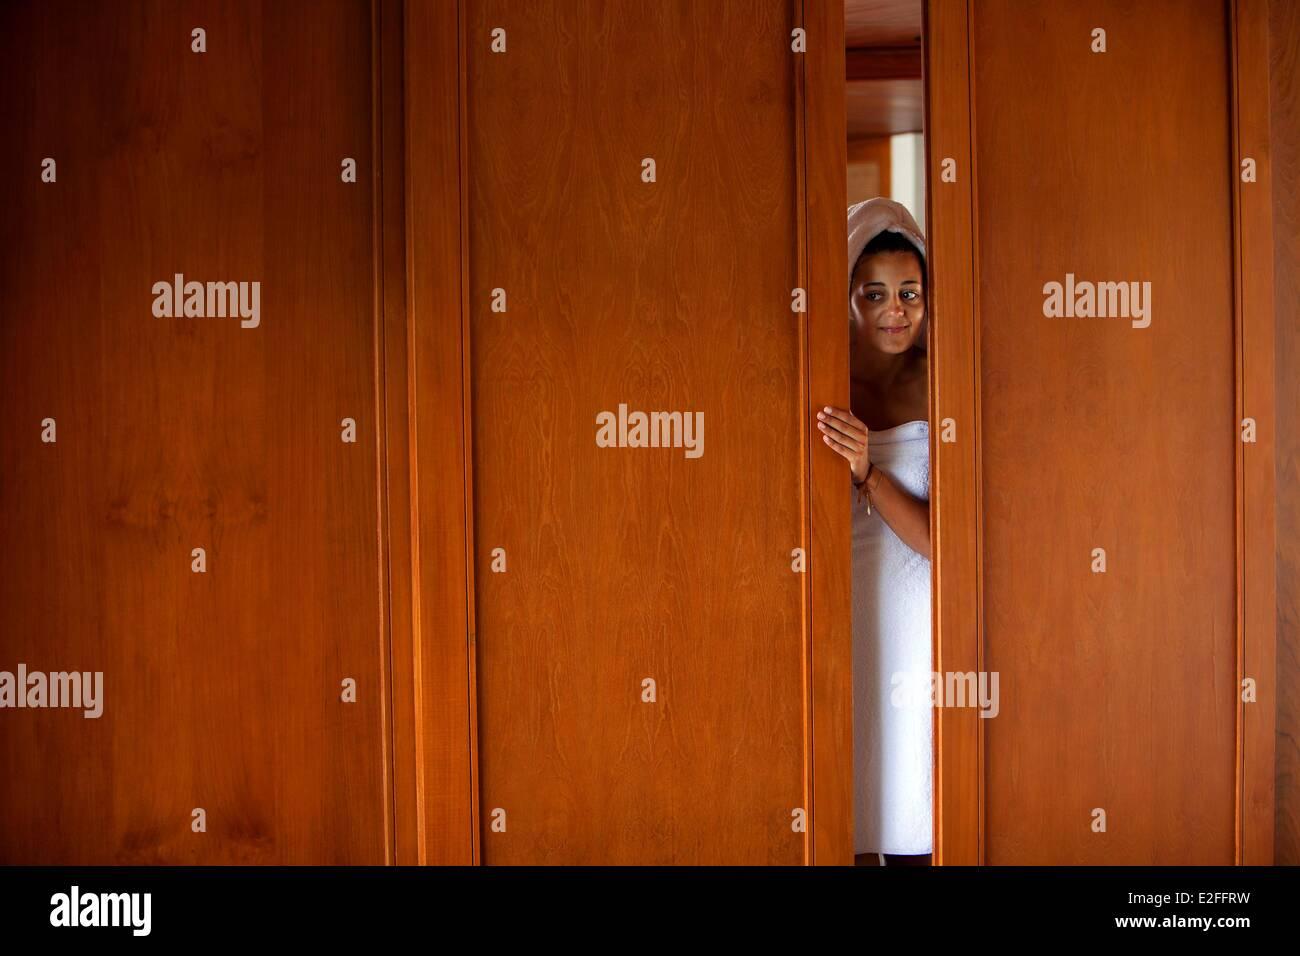 Indonesia, Bali, Ubud, Hotel Amandari, bathroom - Stock Image